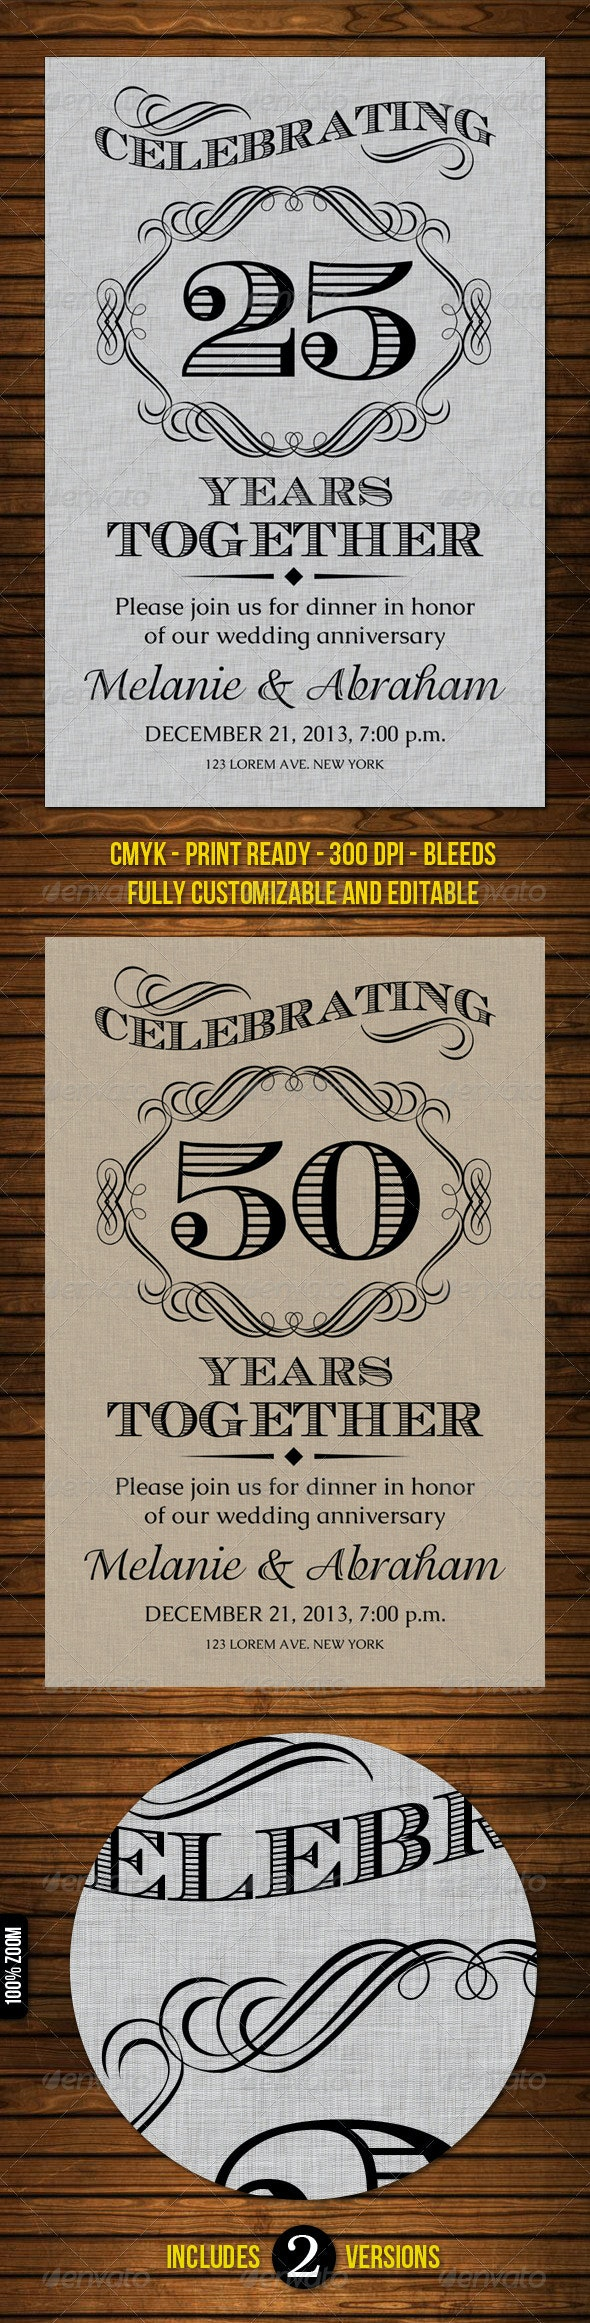 Wedding Anniversary Cards - Anniversary Greeting Cards